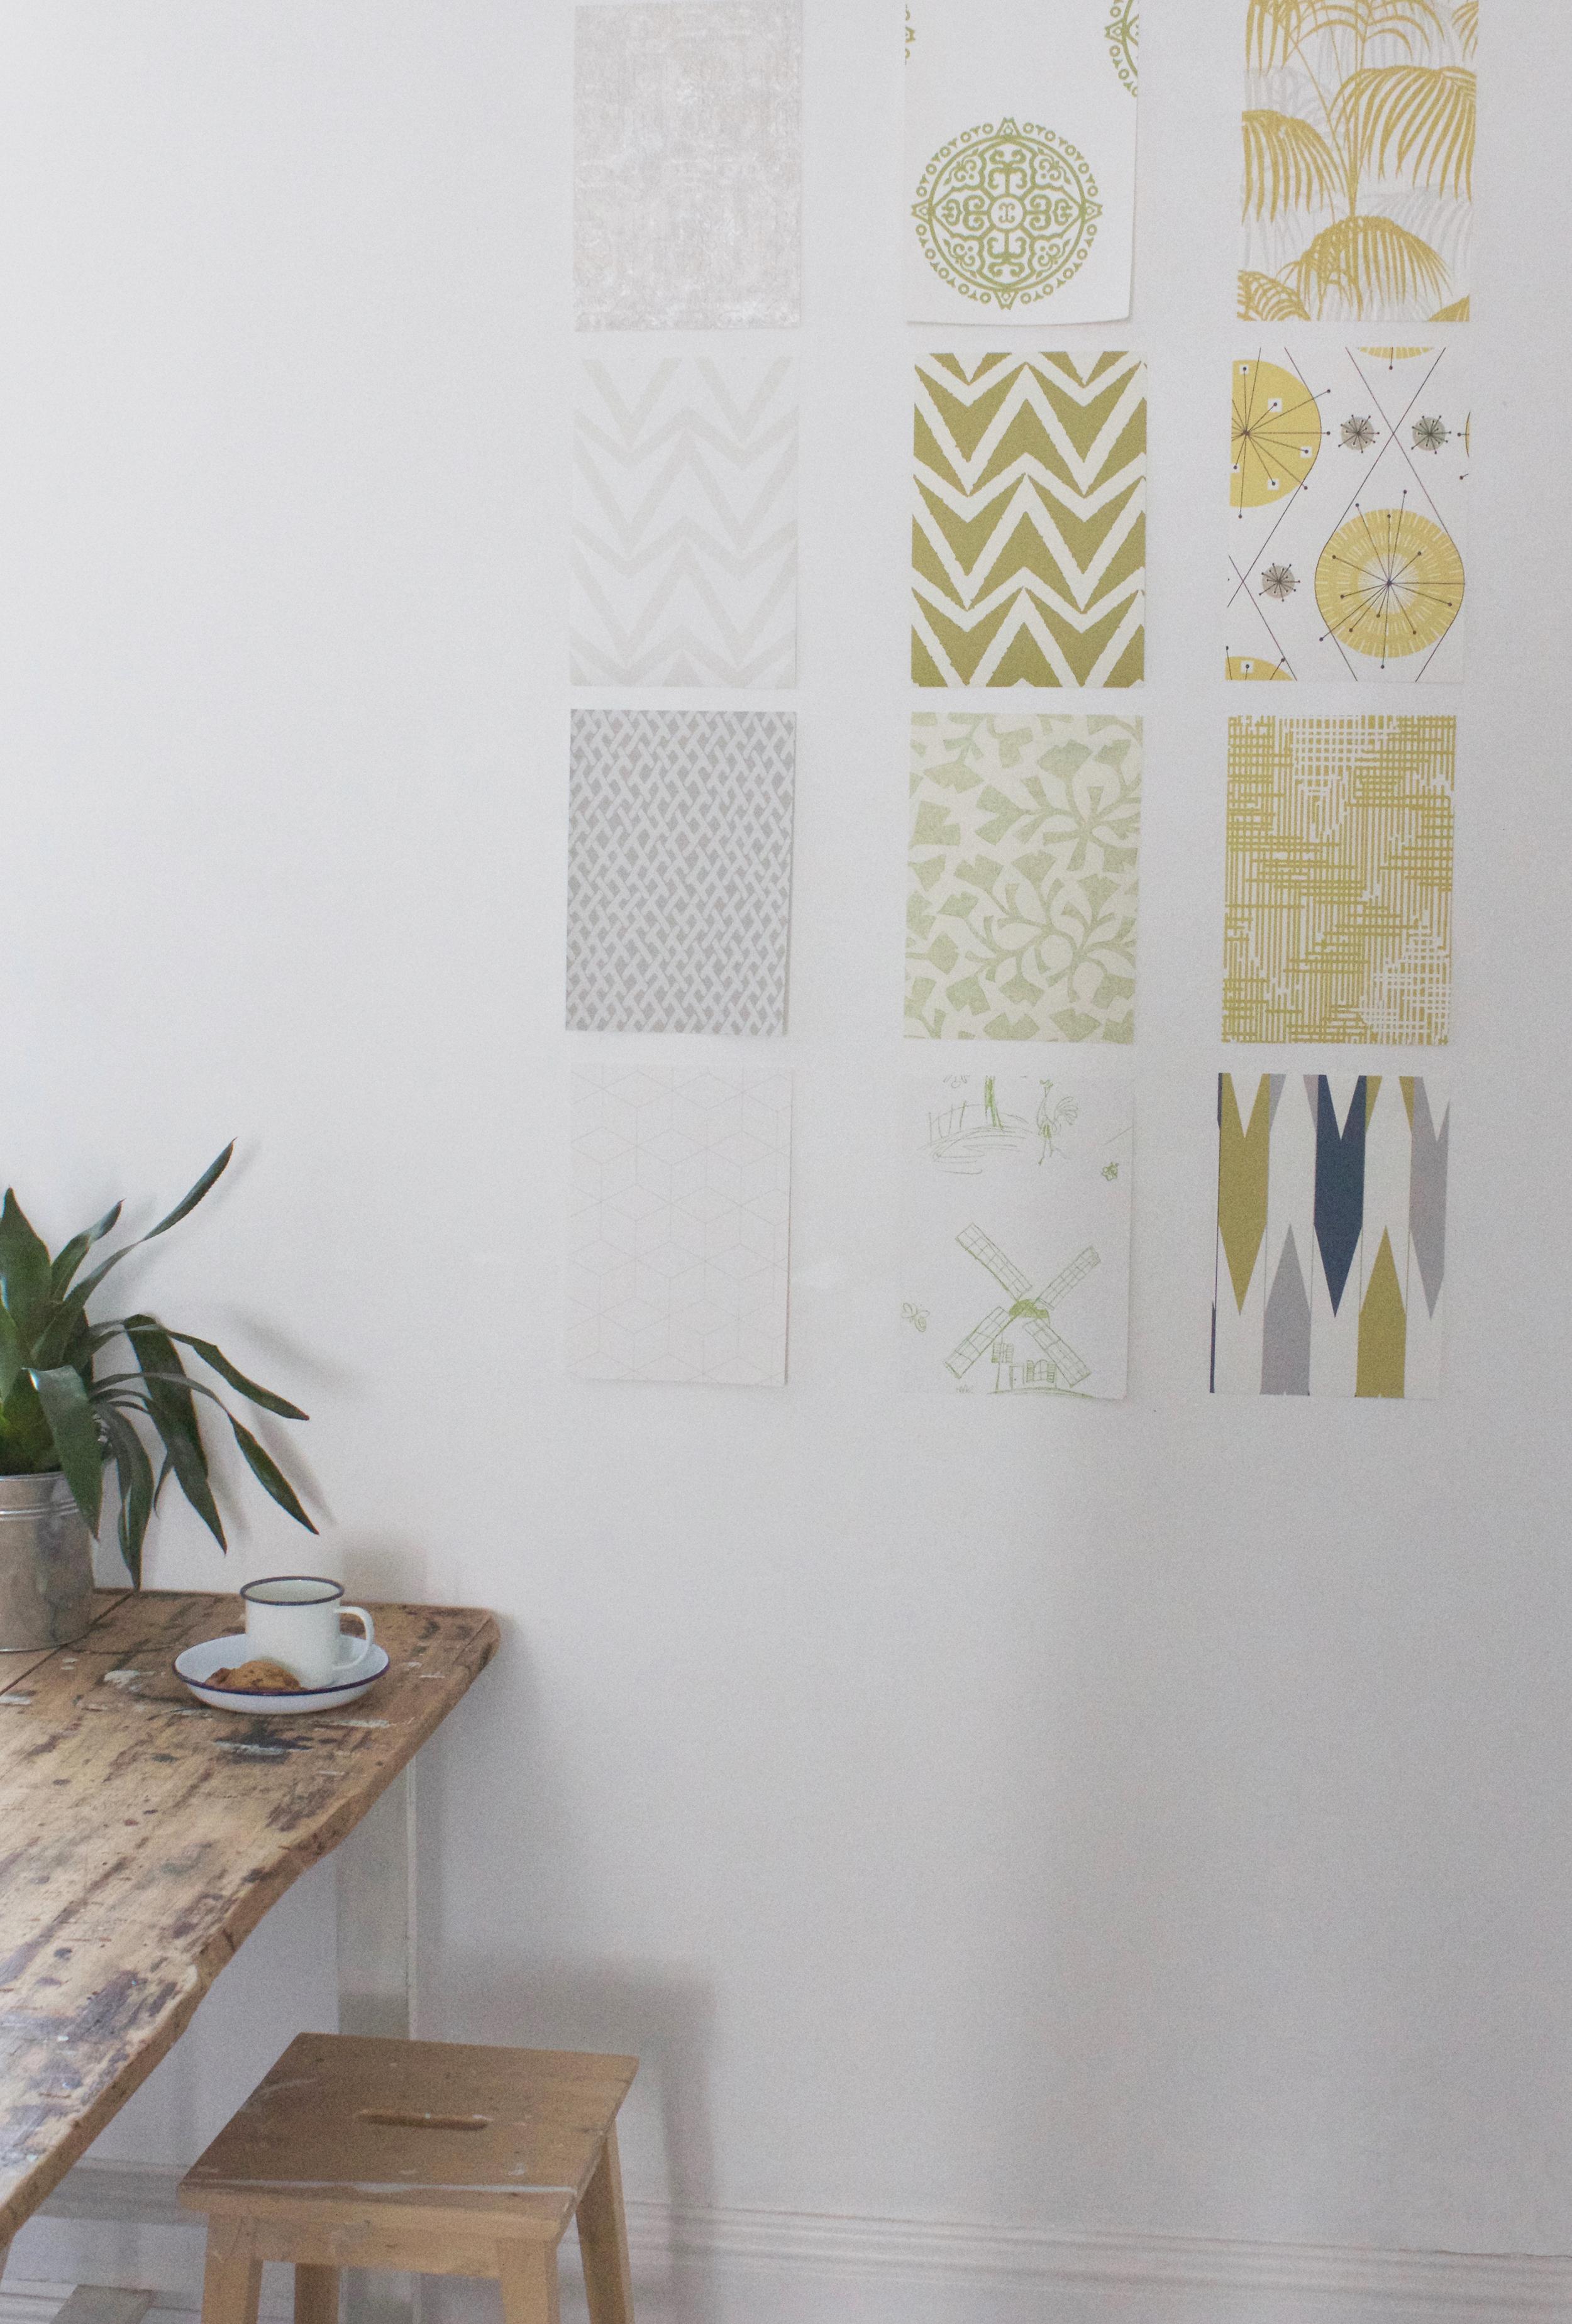 wallpaper samples wall art, tutorial by Hester's handmade home